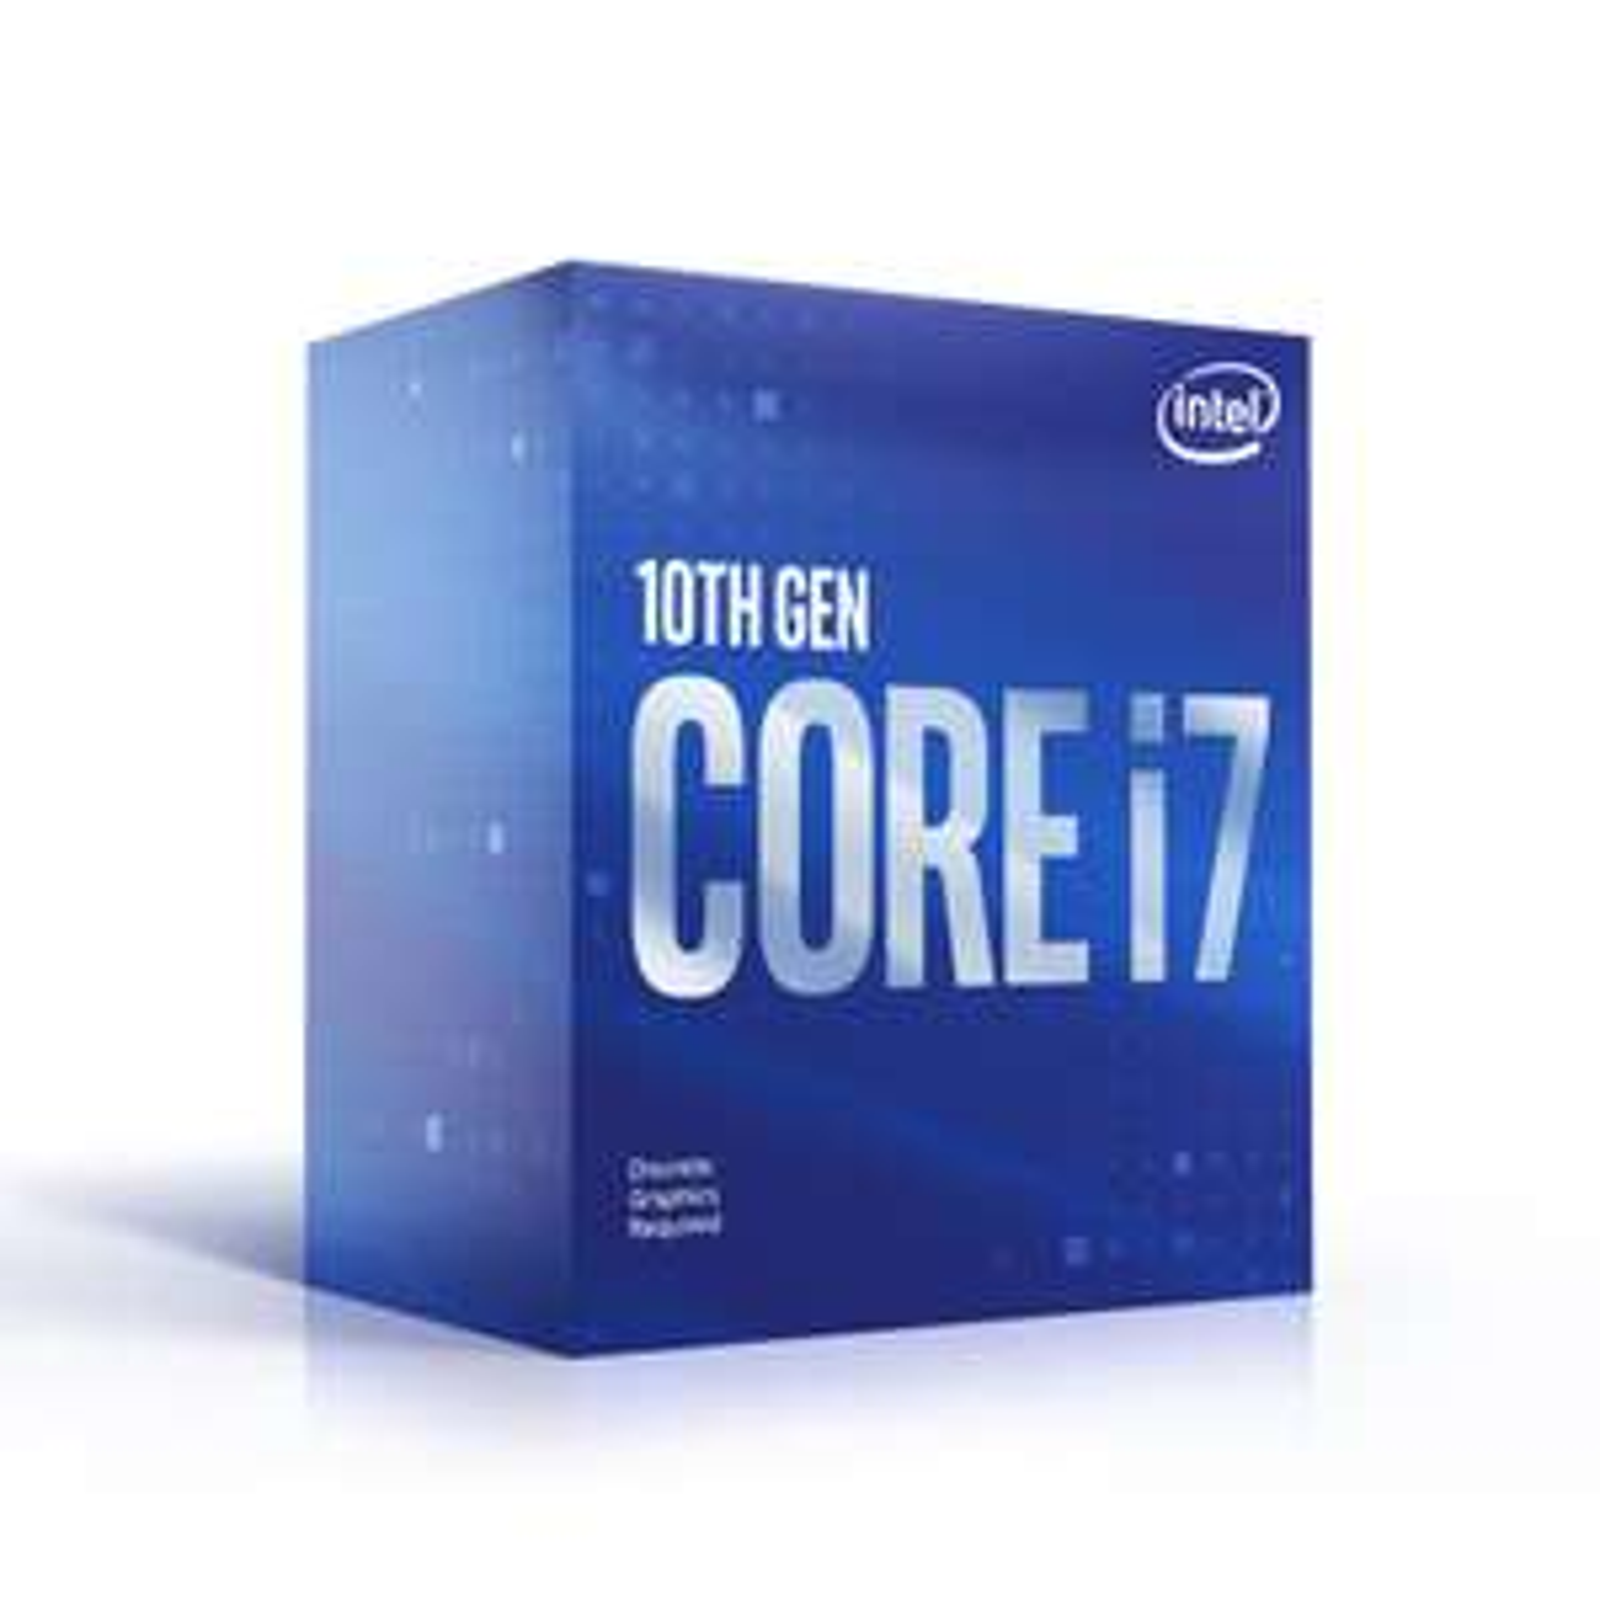 Intel Core I7-10700f Processor 2.9 Ghz CPU £241.21 @ TekShop247